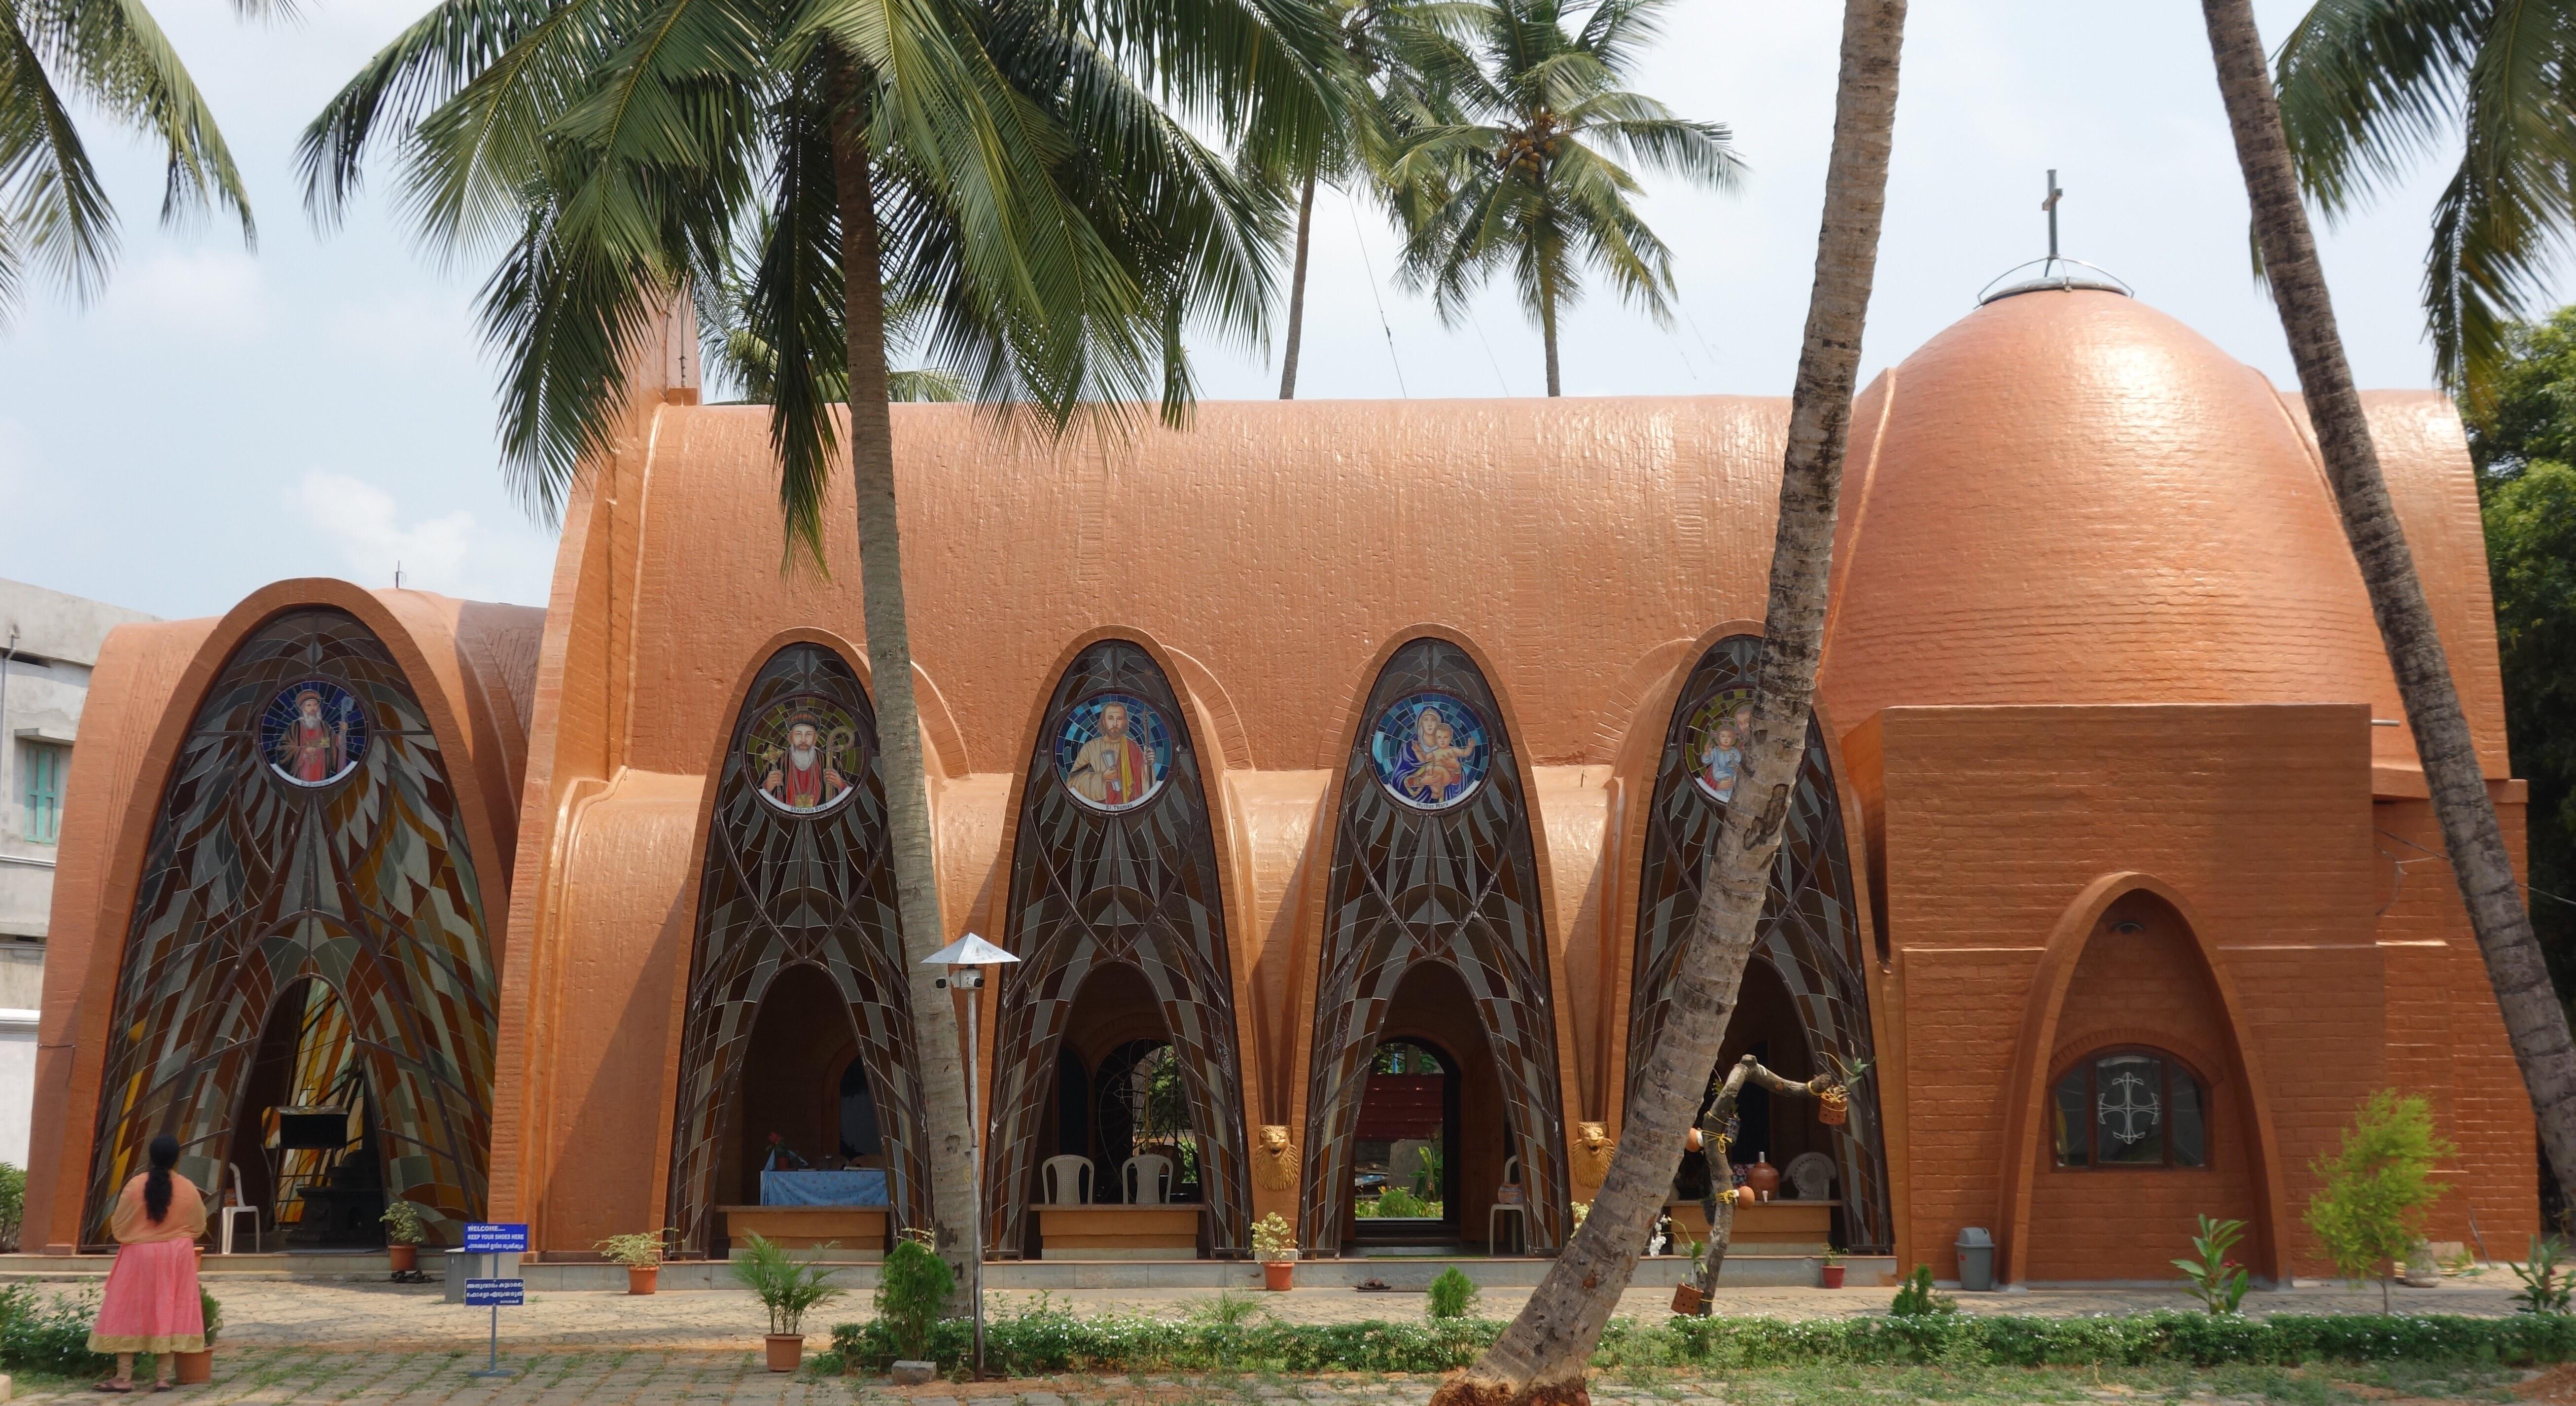 List of tourist attractions in Kochi - Wikipedia